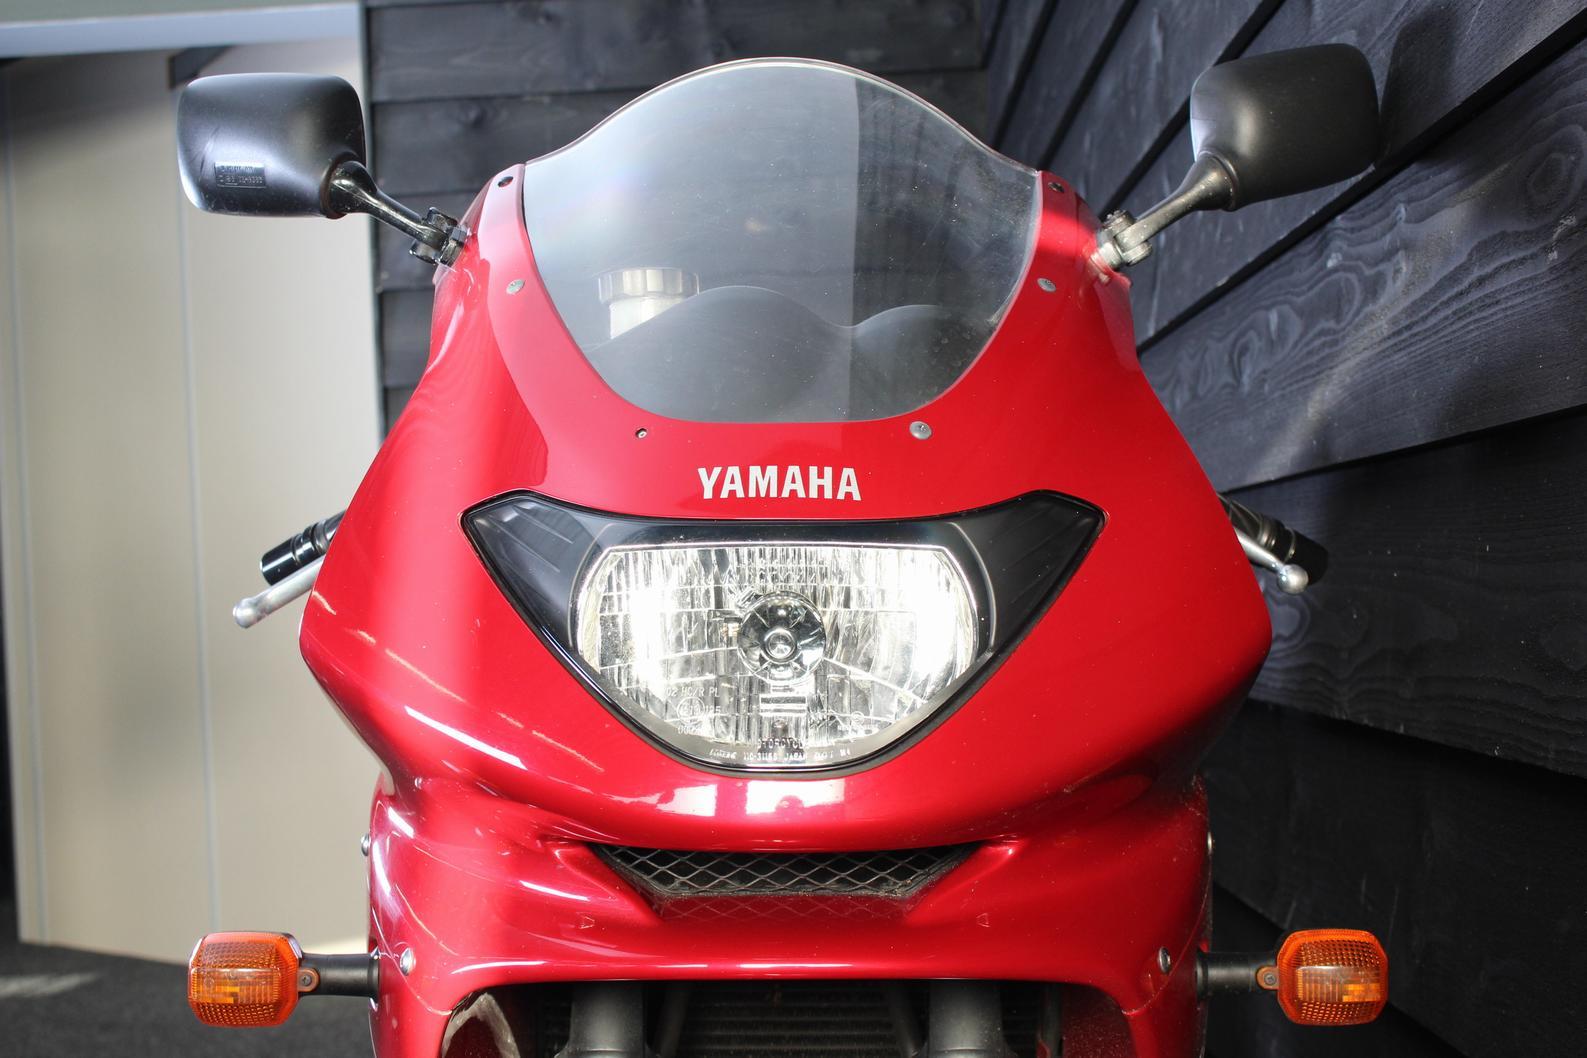 YAMAHA - YZF 600 R Thundercat